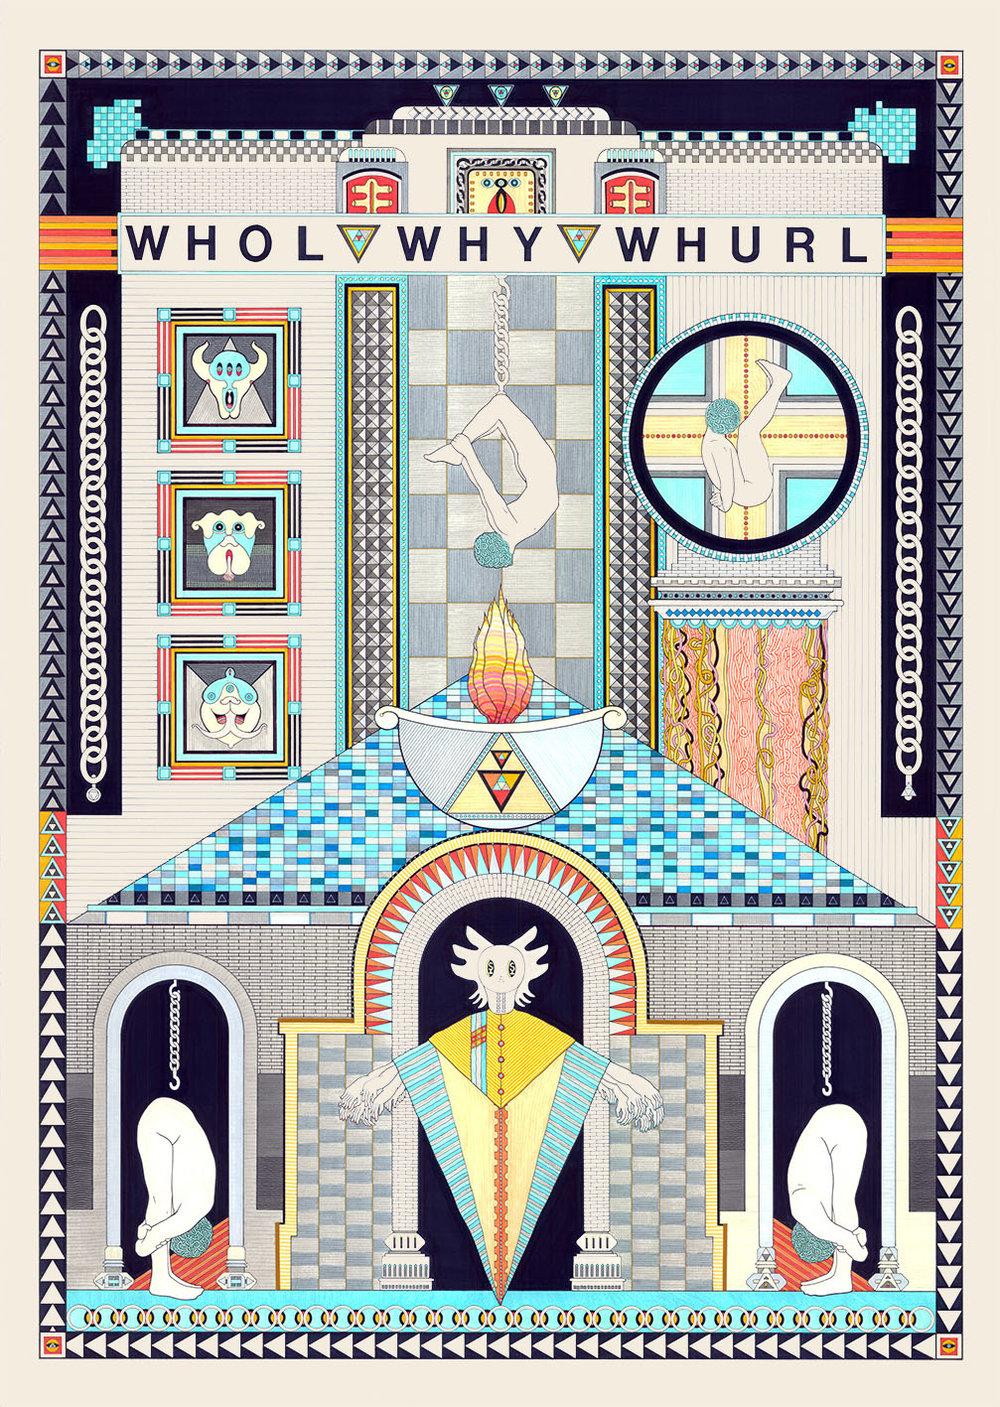 2013 Whol Why Whurl_lowres.jpg